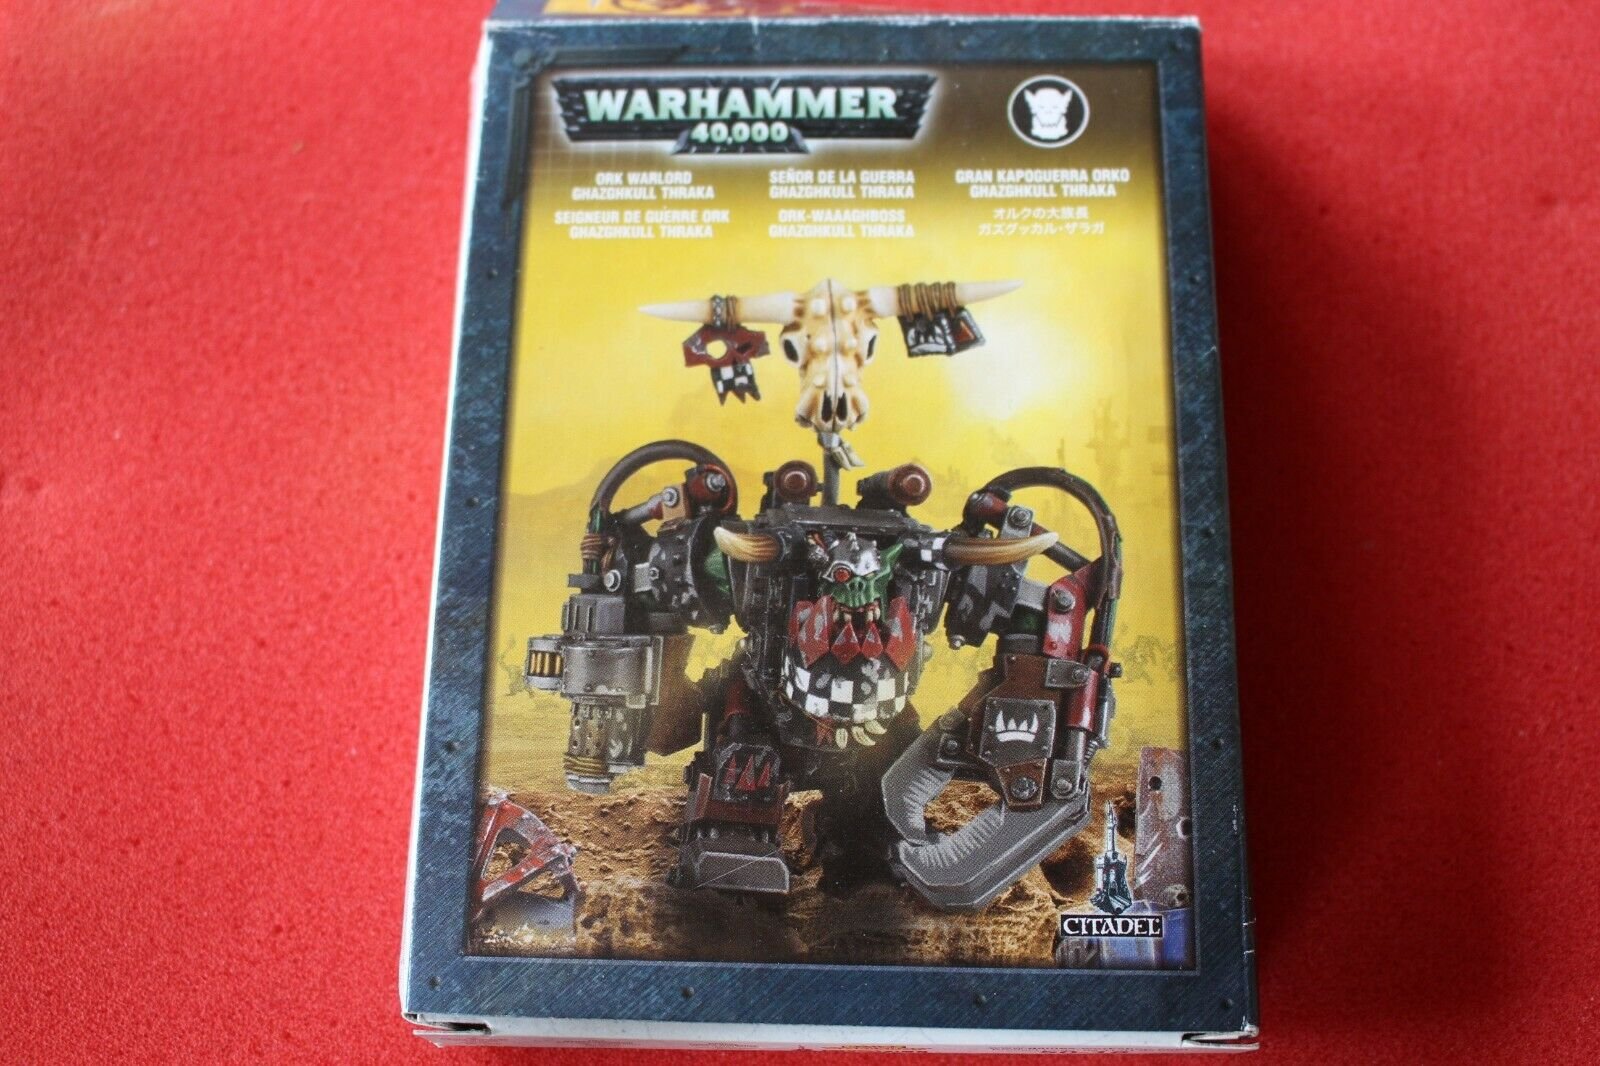 giocos lavoronegozio WARHAMMER 40k Ghazghkull Thraka Orks Warboss  In Mettuttio cifra GW fuori catalogo  best-seller